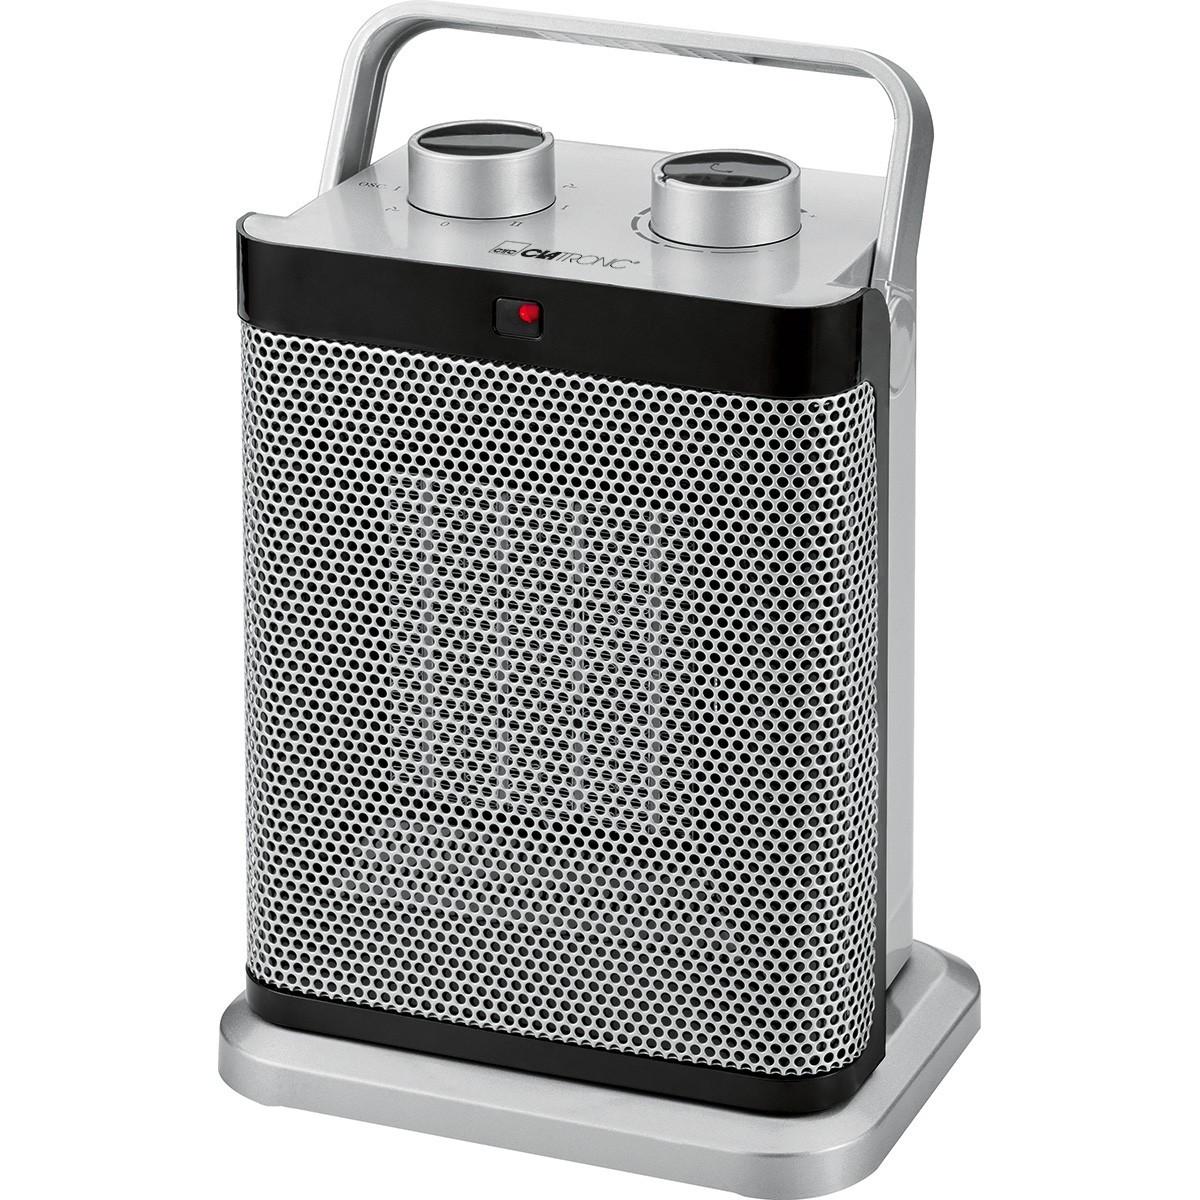 Radiateur Soufflant Consommation concernant radiateur soufflant et oscillant couleur argent - clatronic